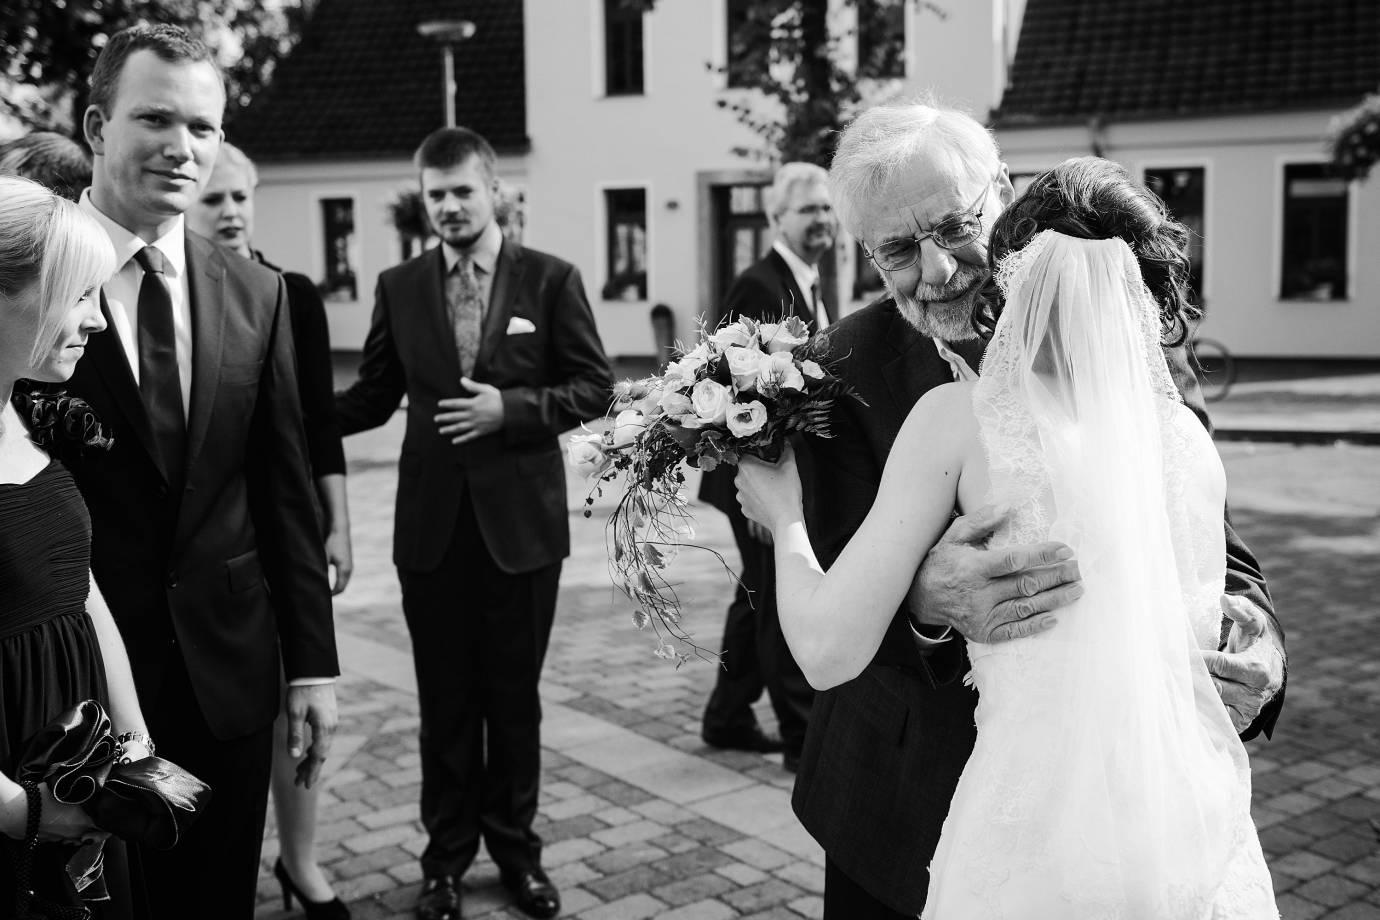 hochzeitsfotograf ohz 066 - Johanna+Sascha